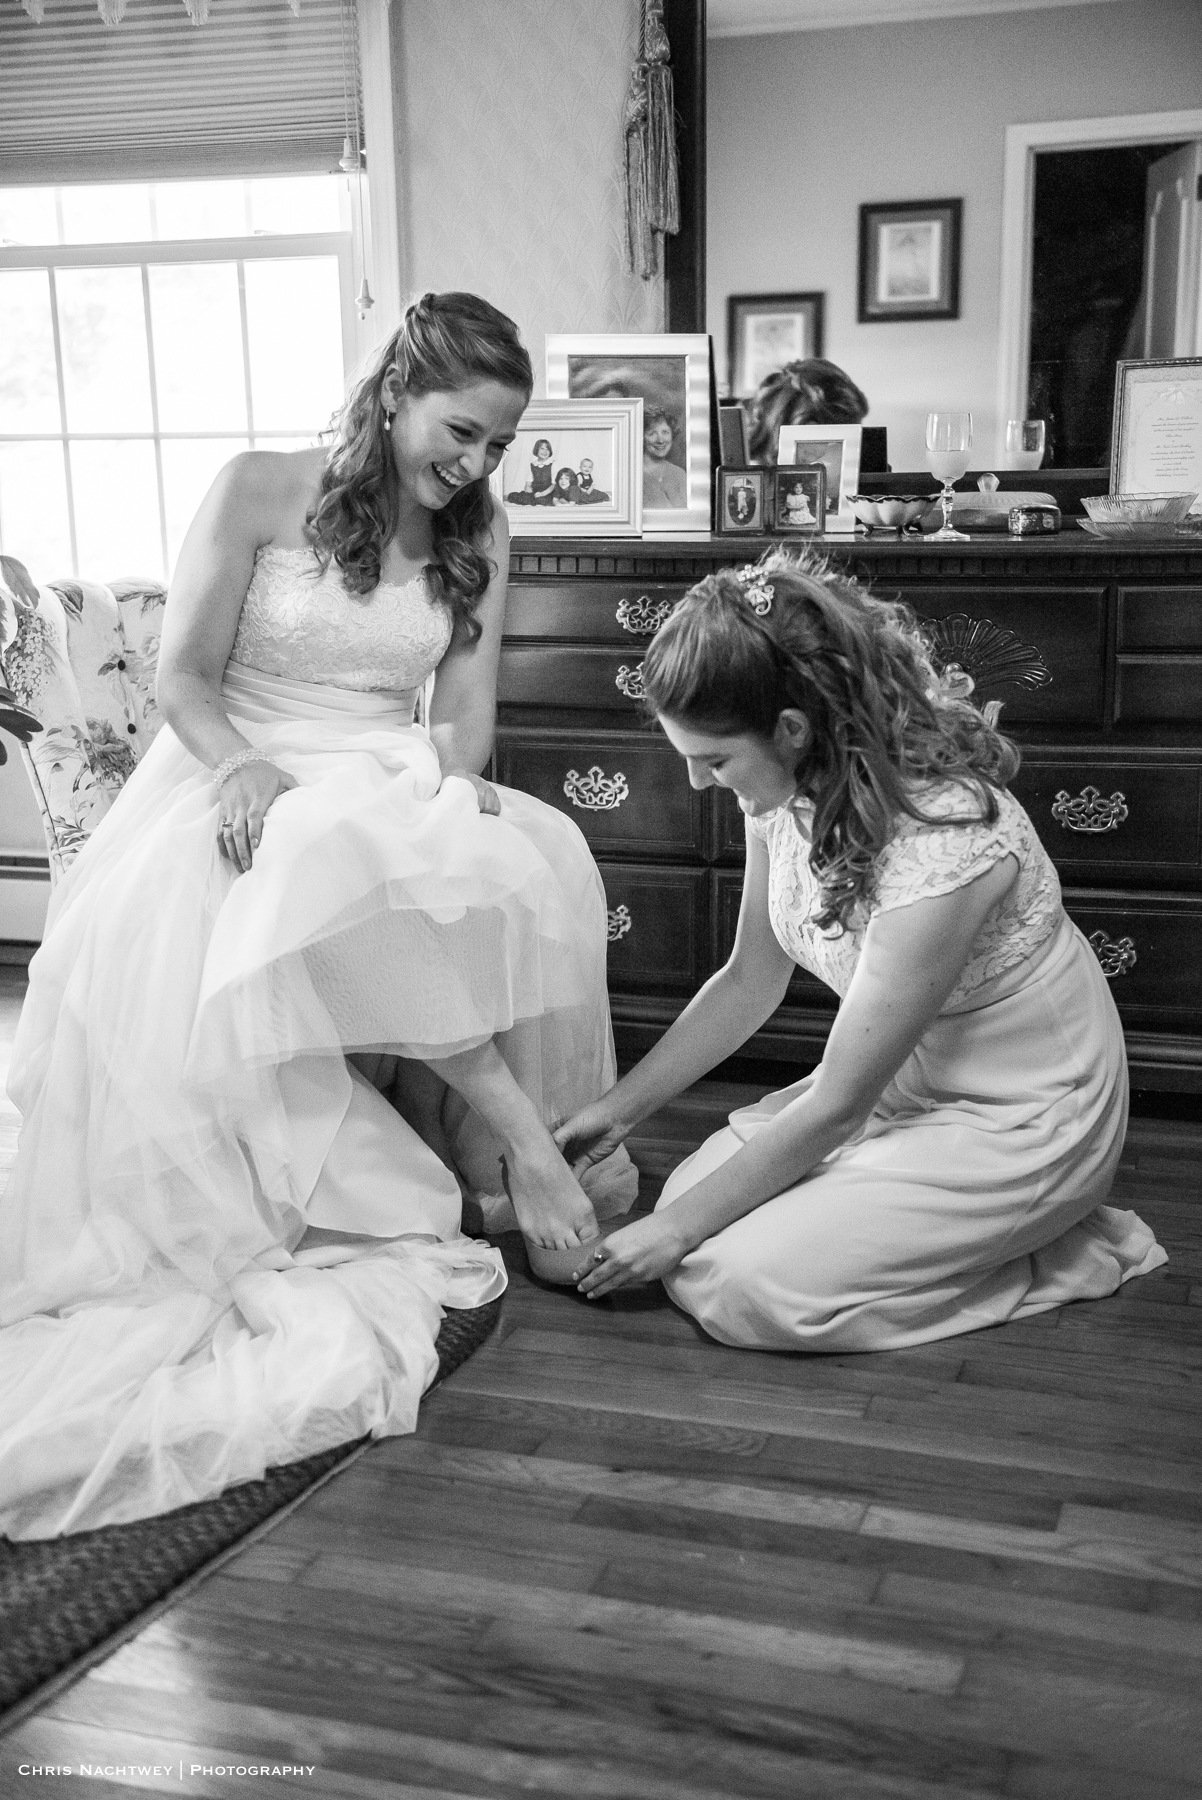 wedding-the-litchfield-inn-ct-photos-chris-nachtwey-photography-2018-11.jpg